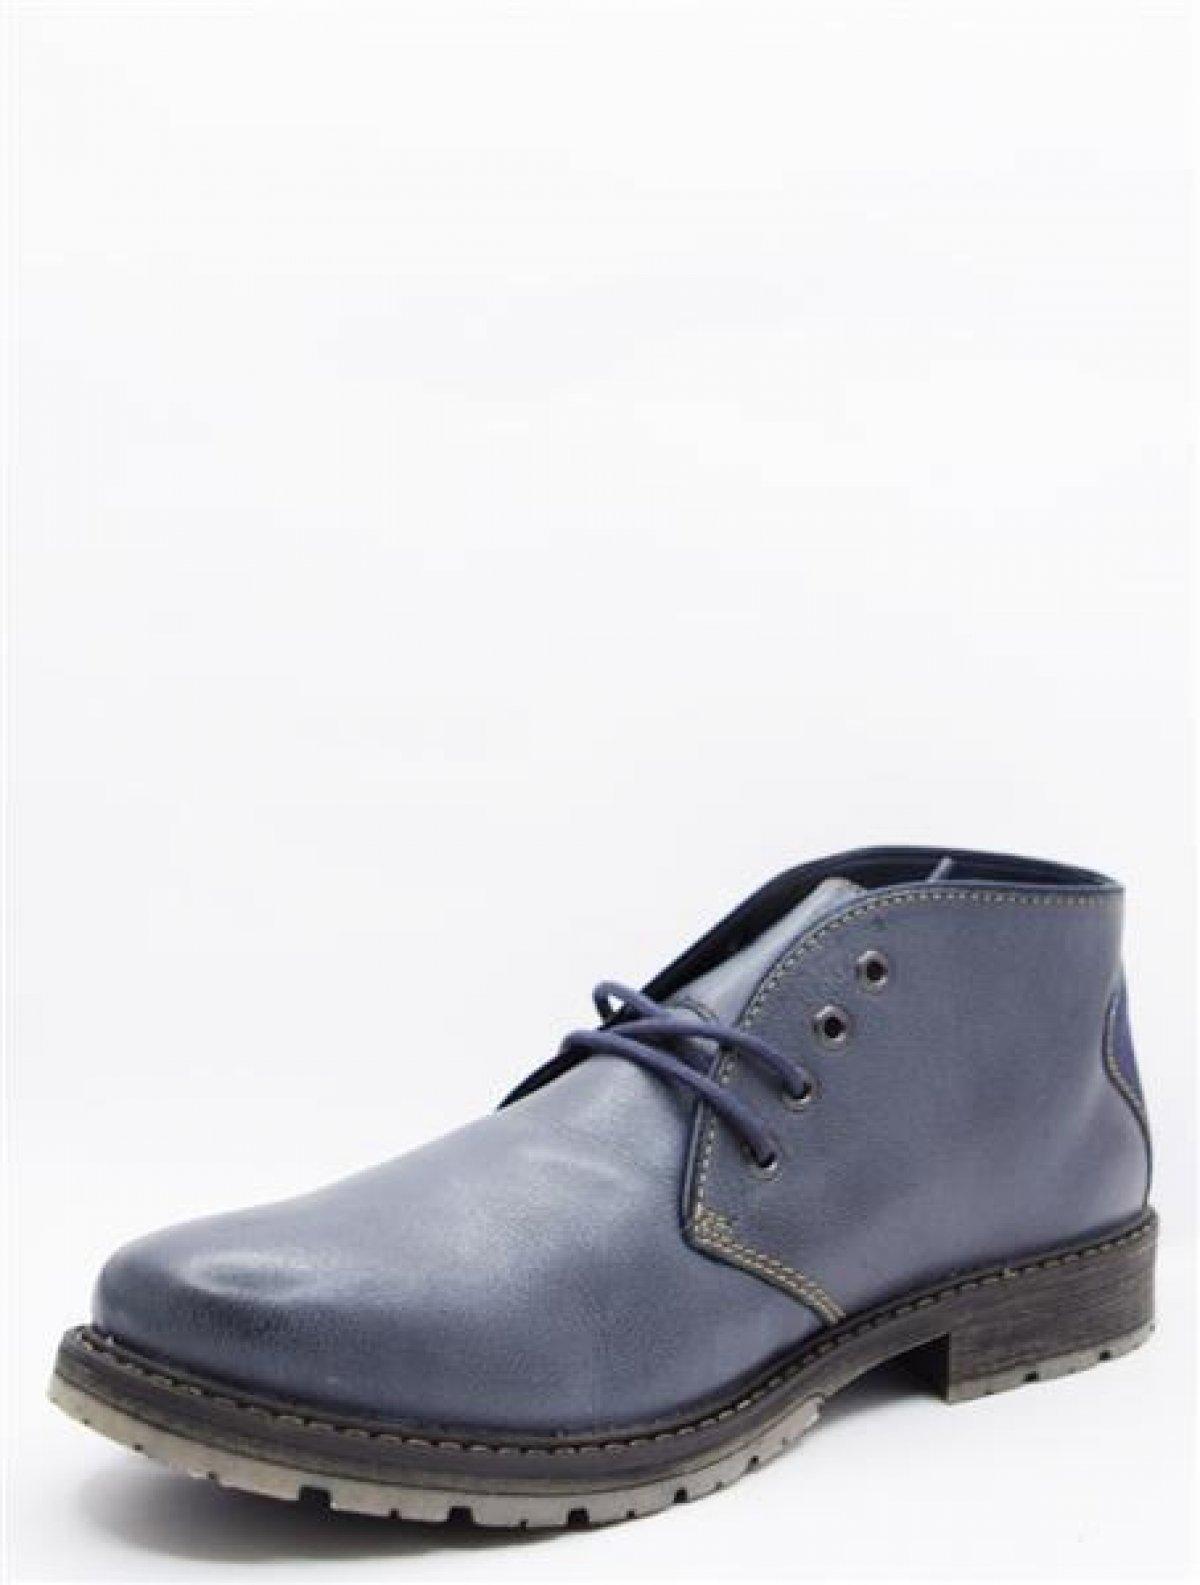 38120-12 ботинки мужские